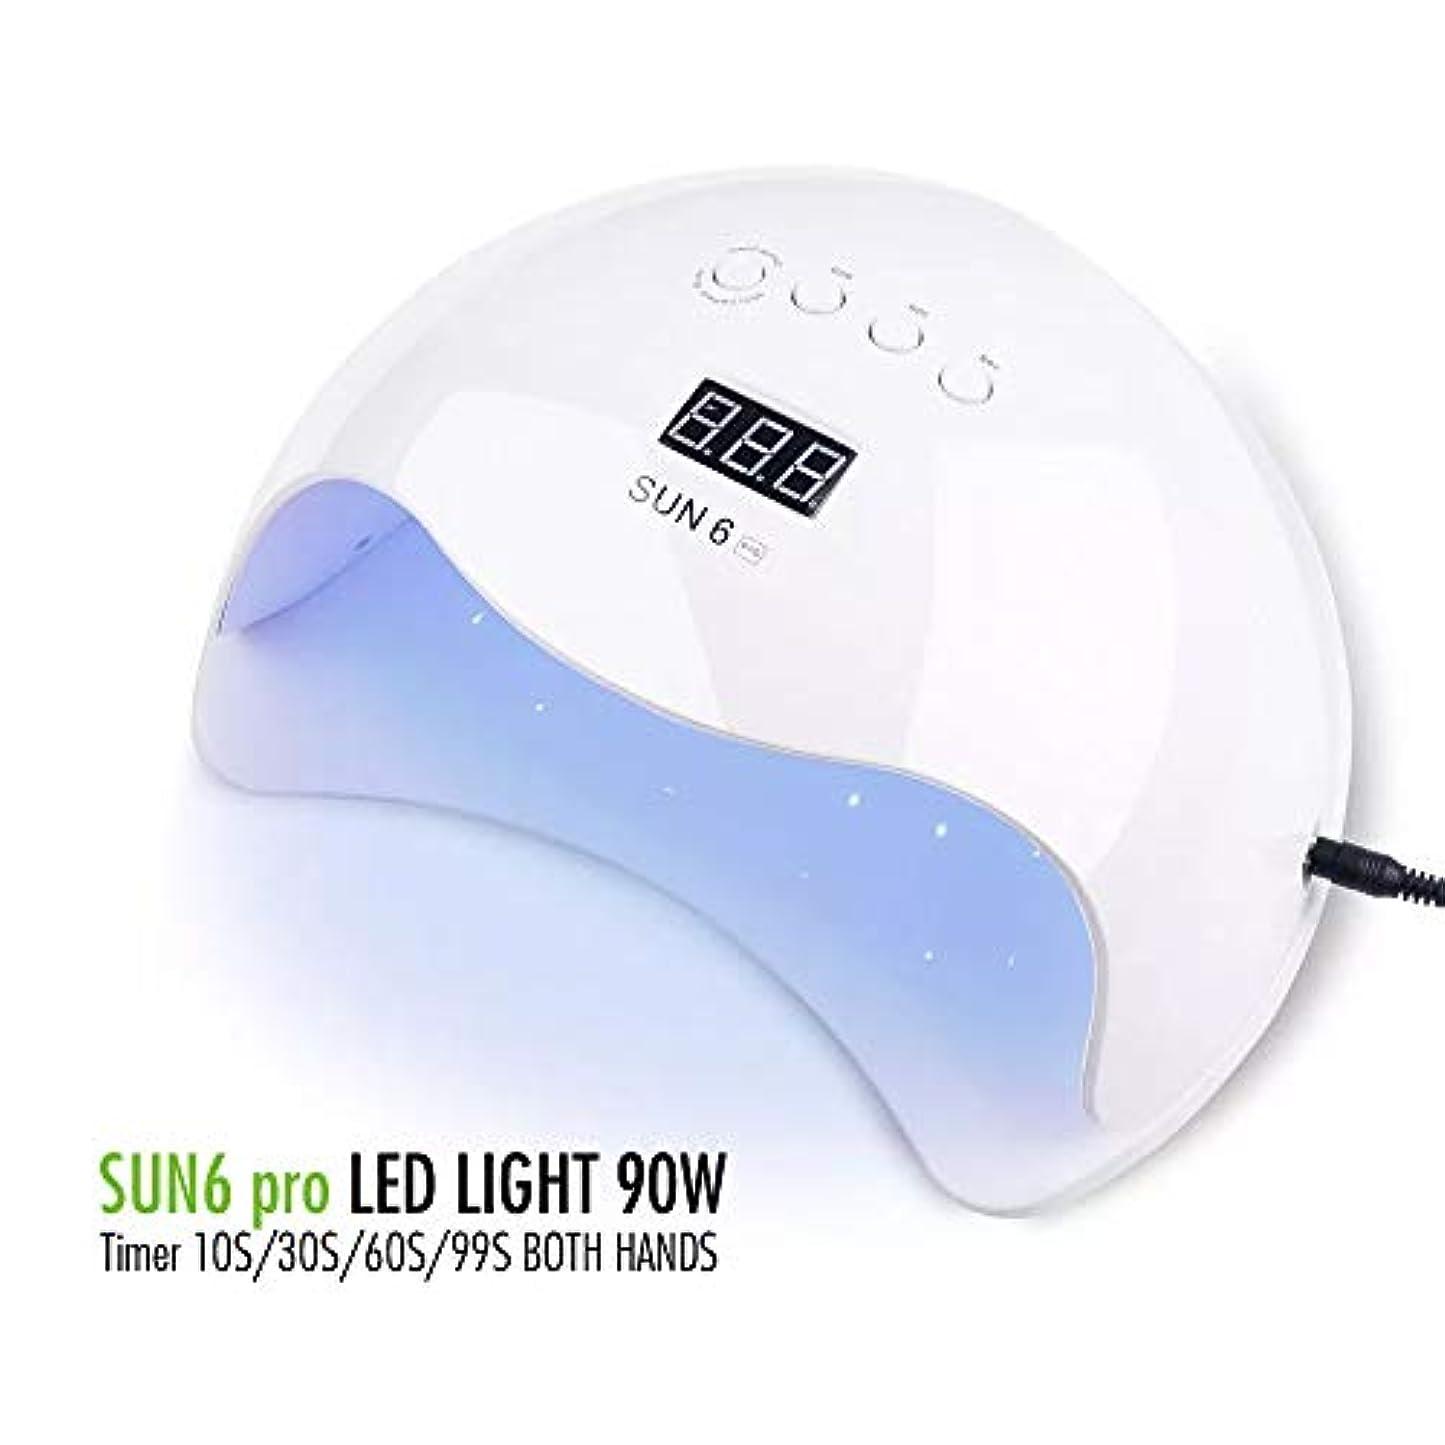 LED & UV ネイルライト UV+LED 90w UV/LEDライト 人感センサー付 低ヒート機能 ネイルドライヤー UVライト 【UV+LED二重光源】 6ヶ月保証付